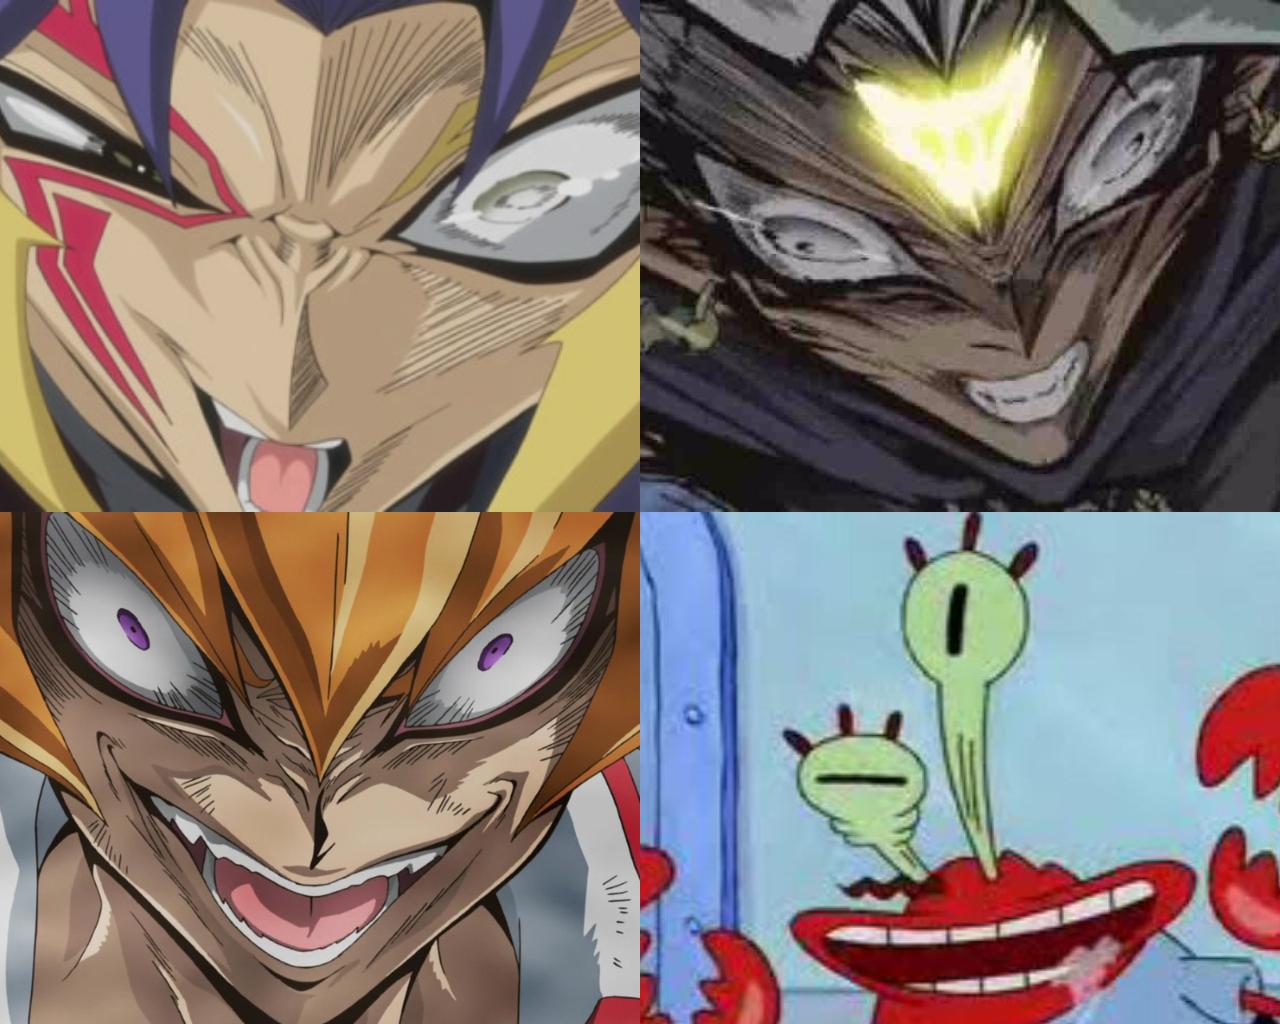 Yu gi oh trading card game fictional character anime